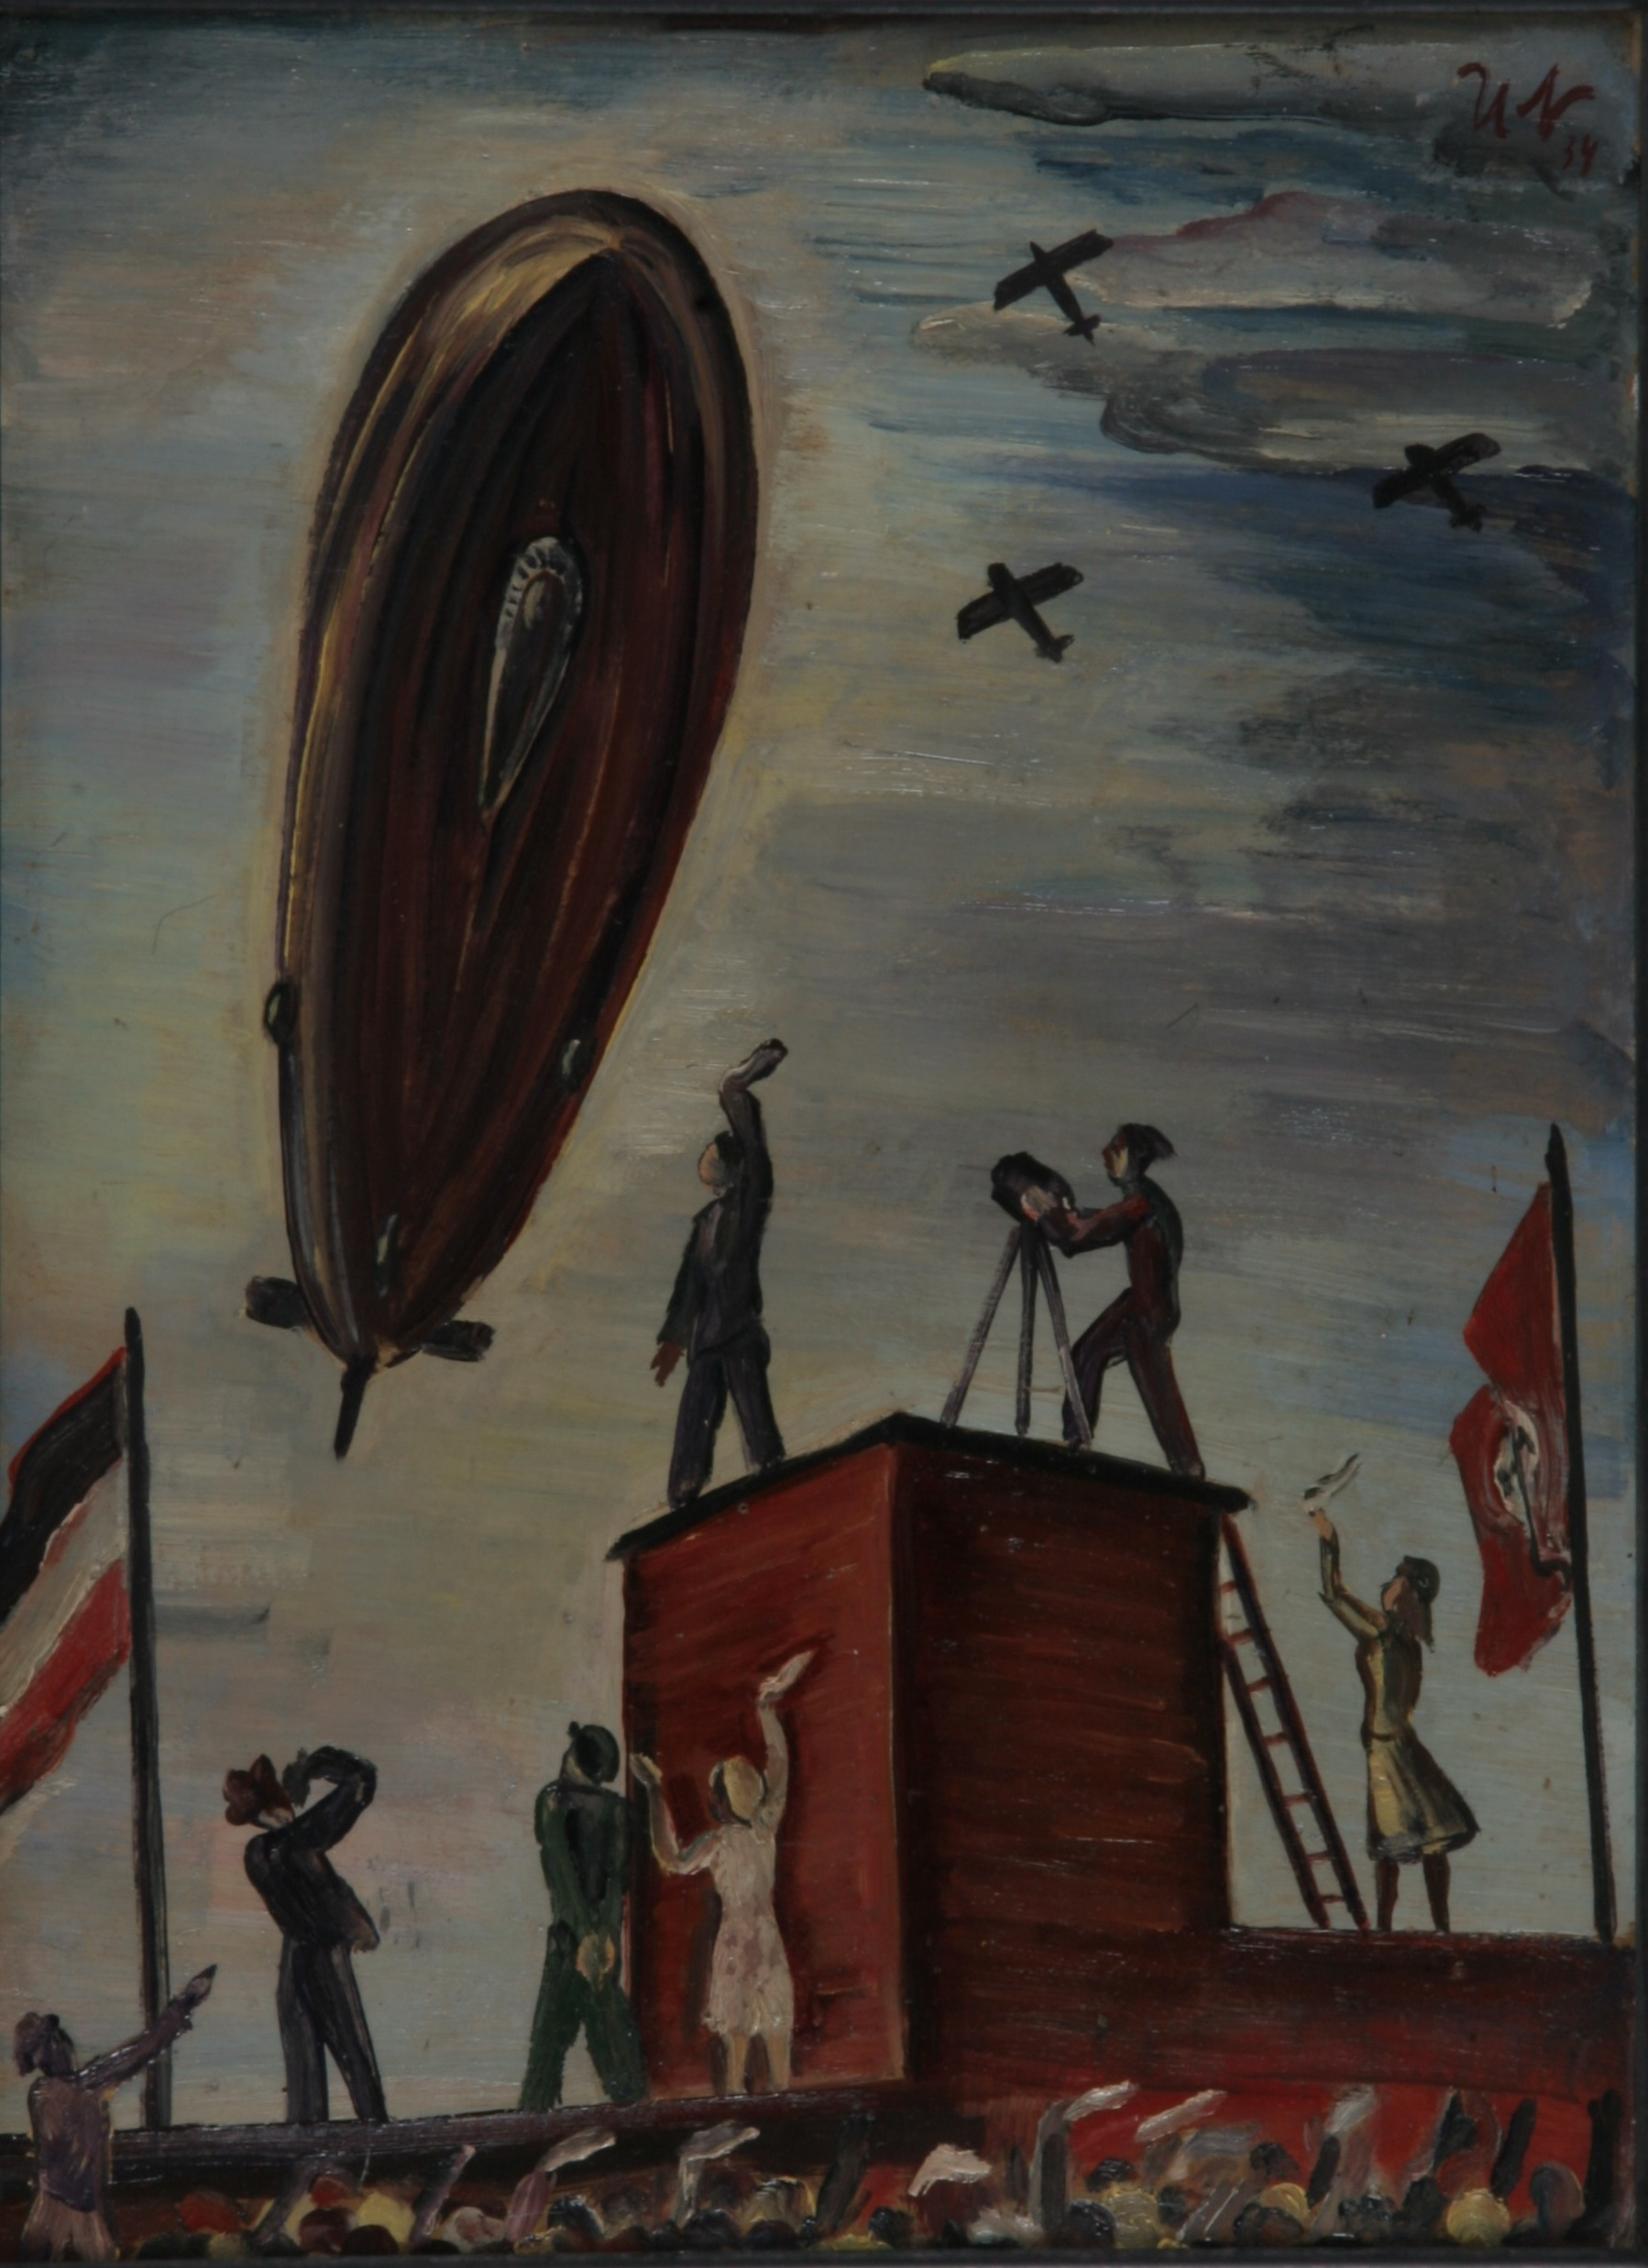 Flug des Zeppelin, 1934, 1934, Öl auf Karton, 31 x 34 cm gerahmt